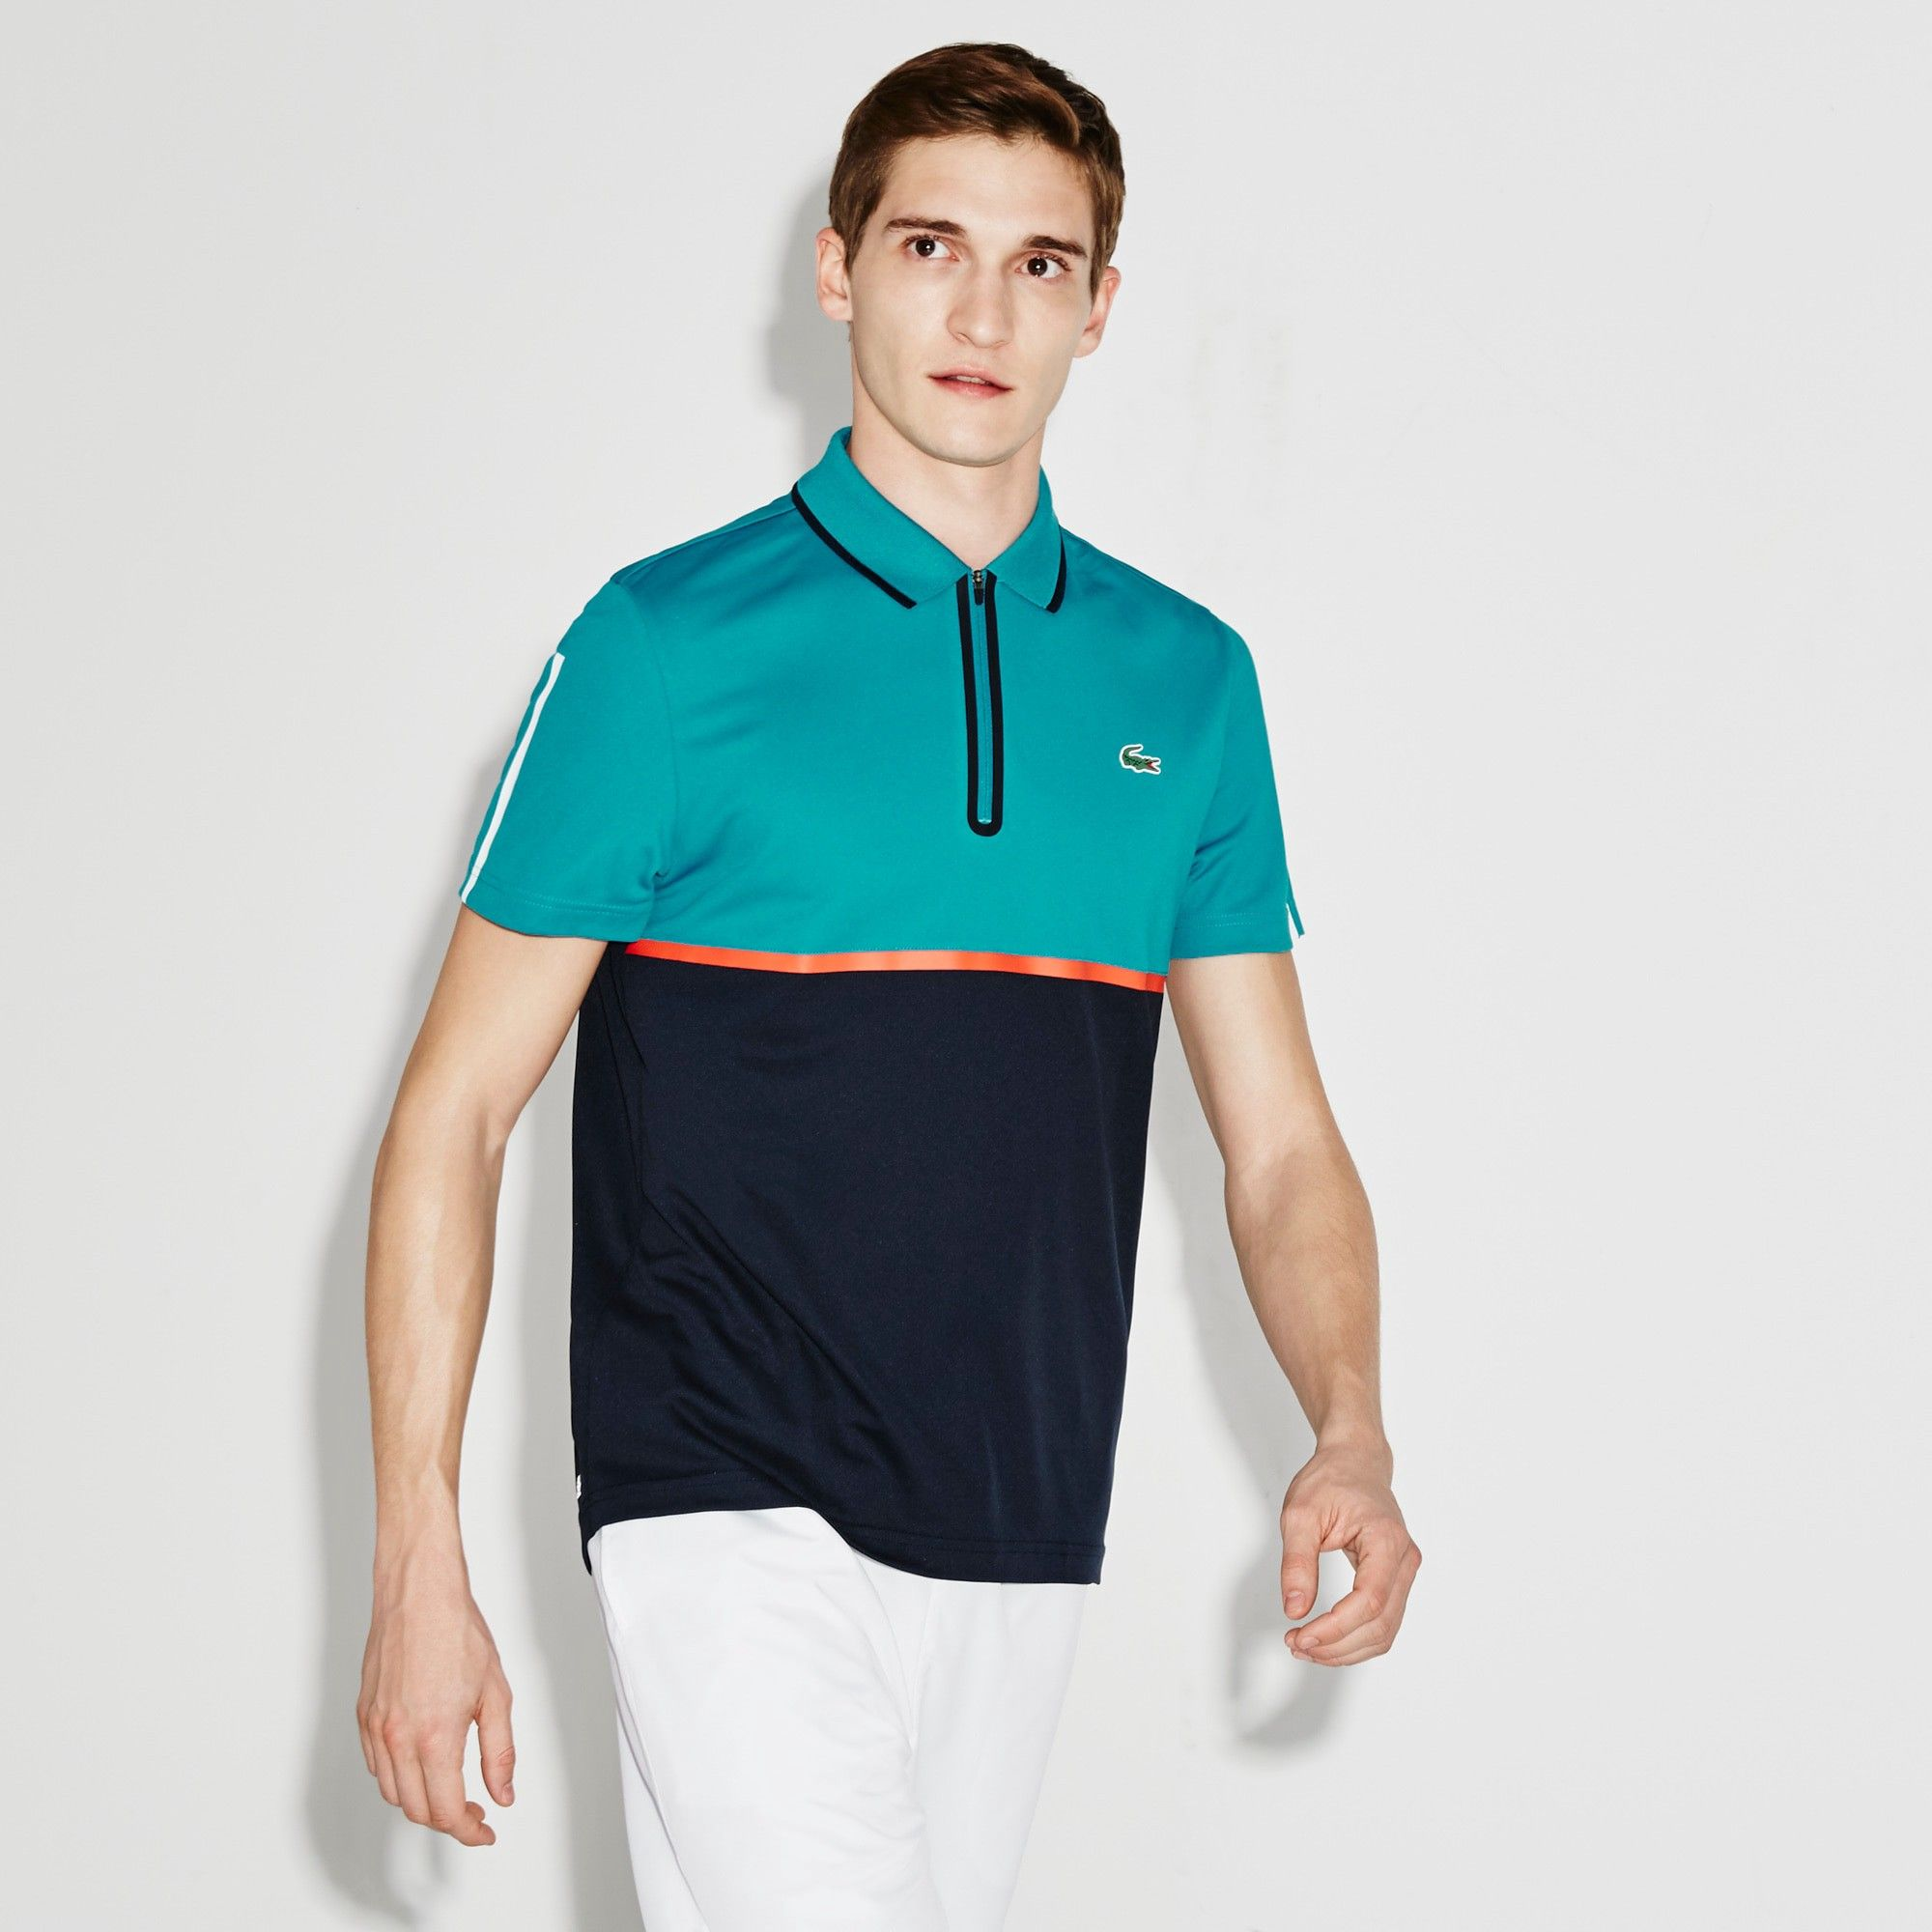 Lacoste Men S Sport Ultra Dry Zip Pique Knit Tennis Polo Shirt Oceanie Navy Blue Etna Re Modesens Lacoste Men Polo Shirt Lacoste